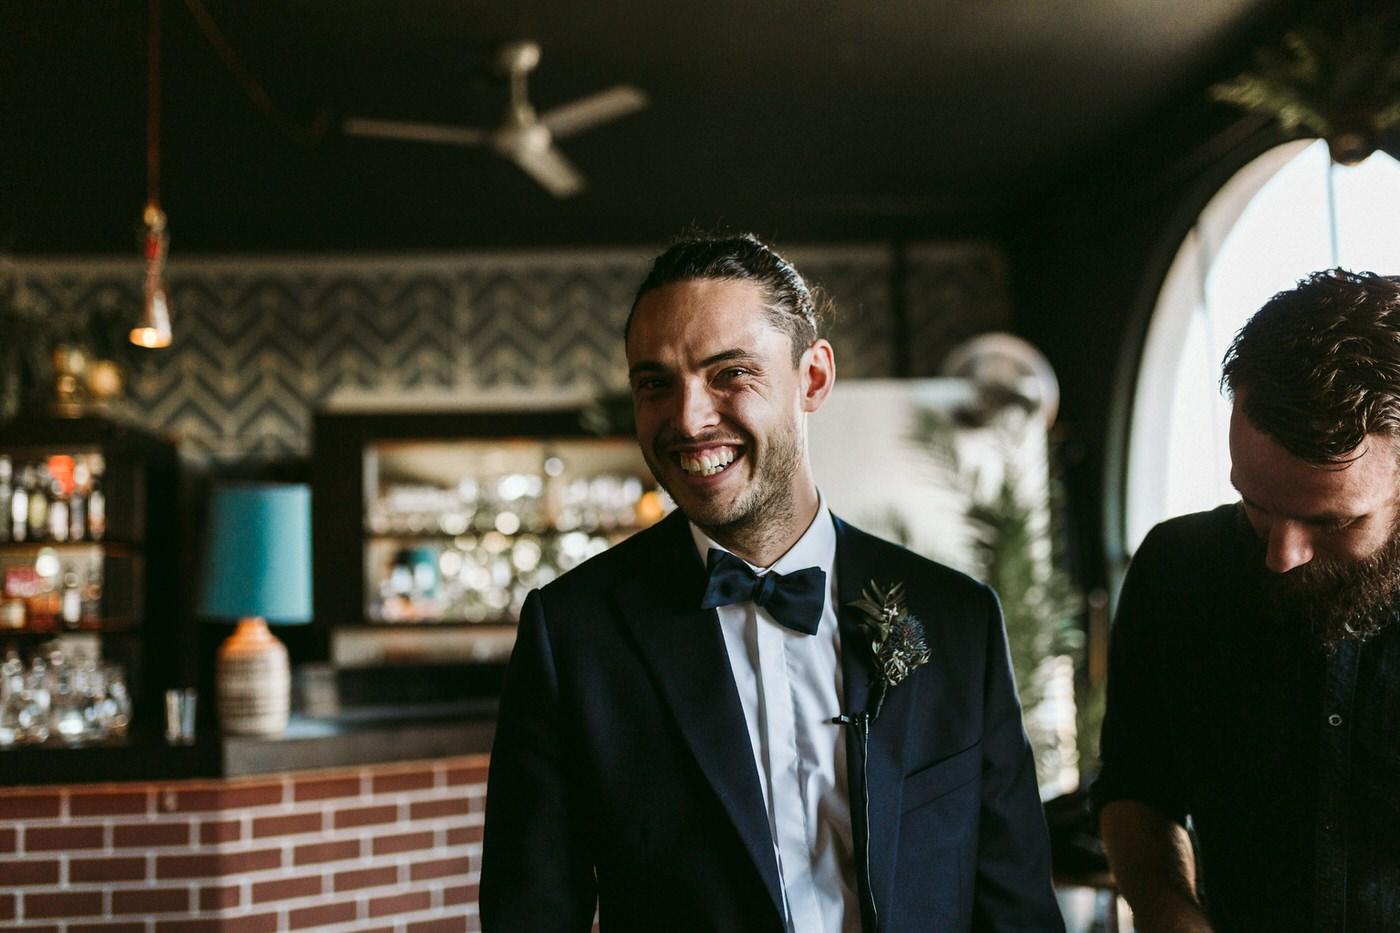 GoldandGrit_KimMatt_Panama-Dining-Room-Fitzroy-Collingwood-Relaxed-Fun-Candid-Wedding-Photography_65.jpg